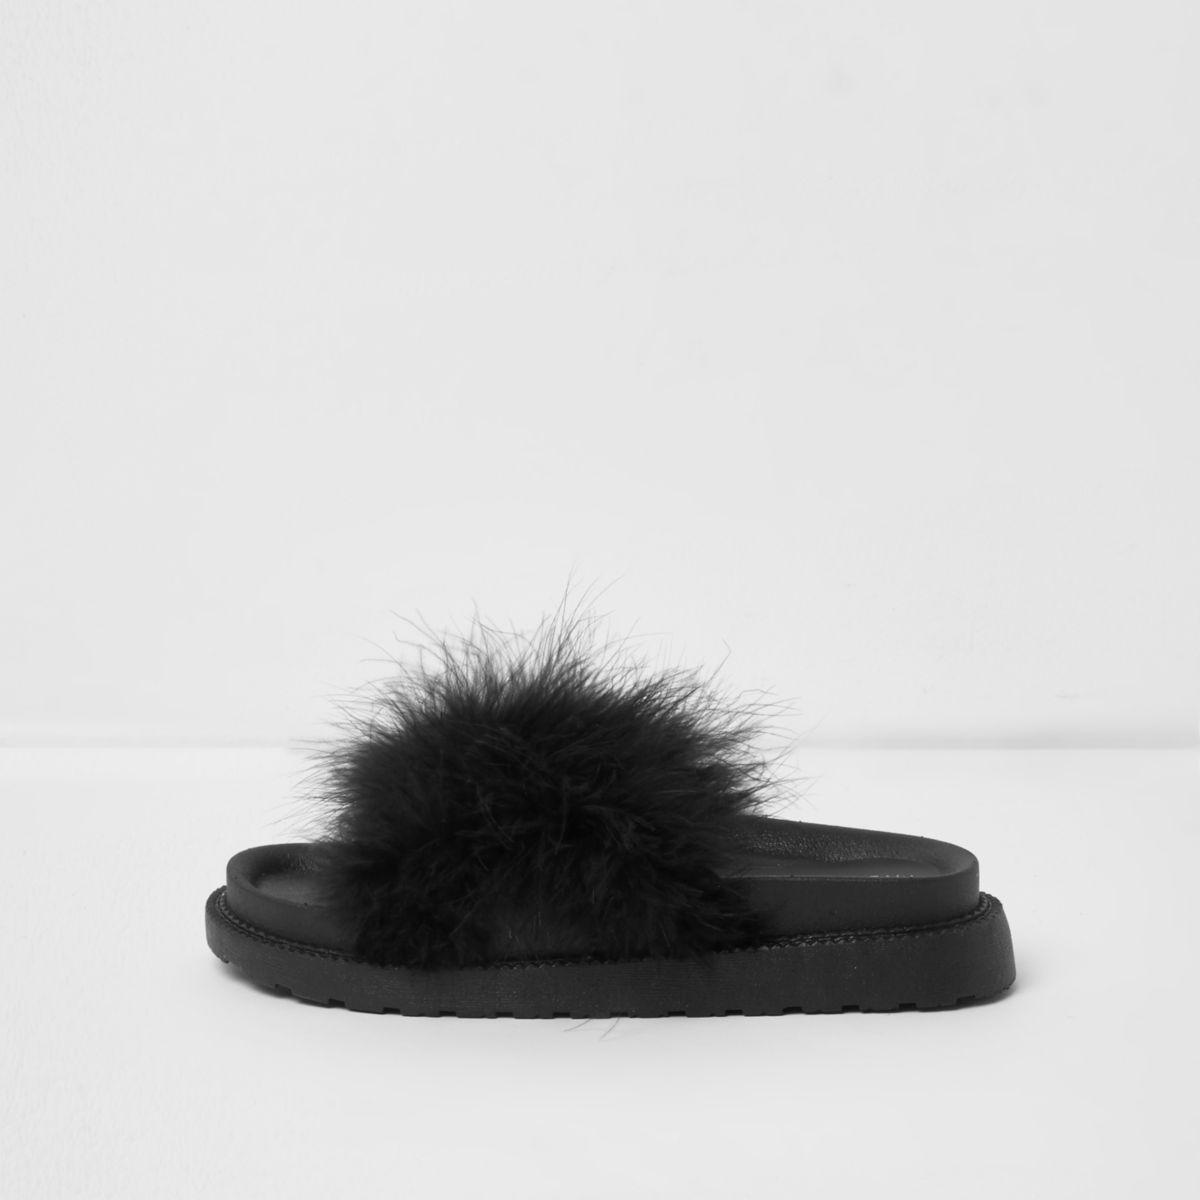 Black cross strap feather sliders